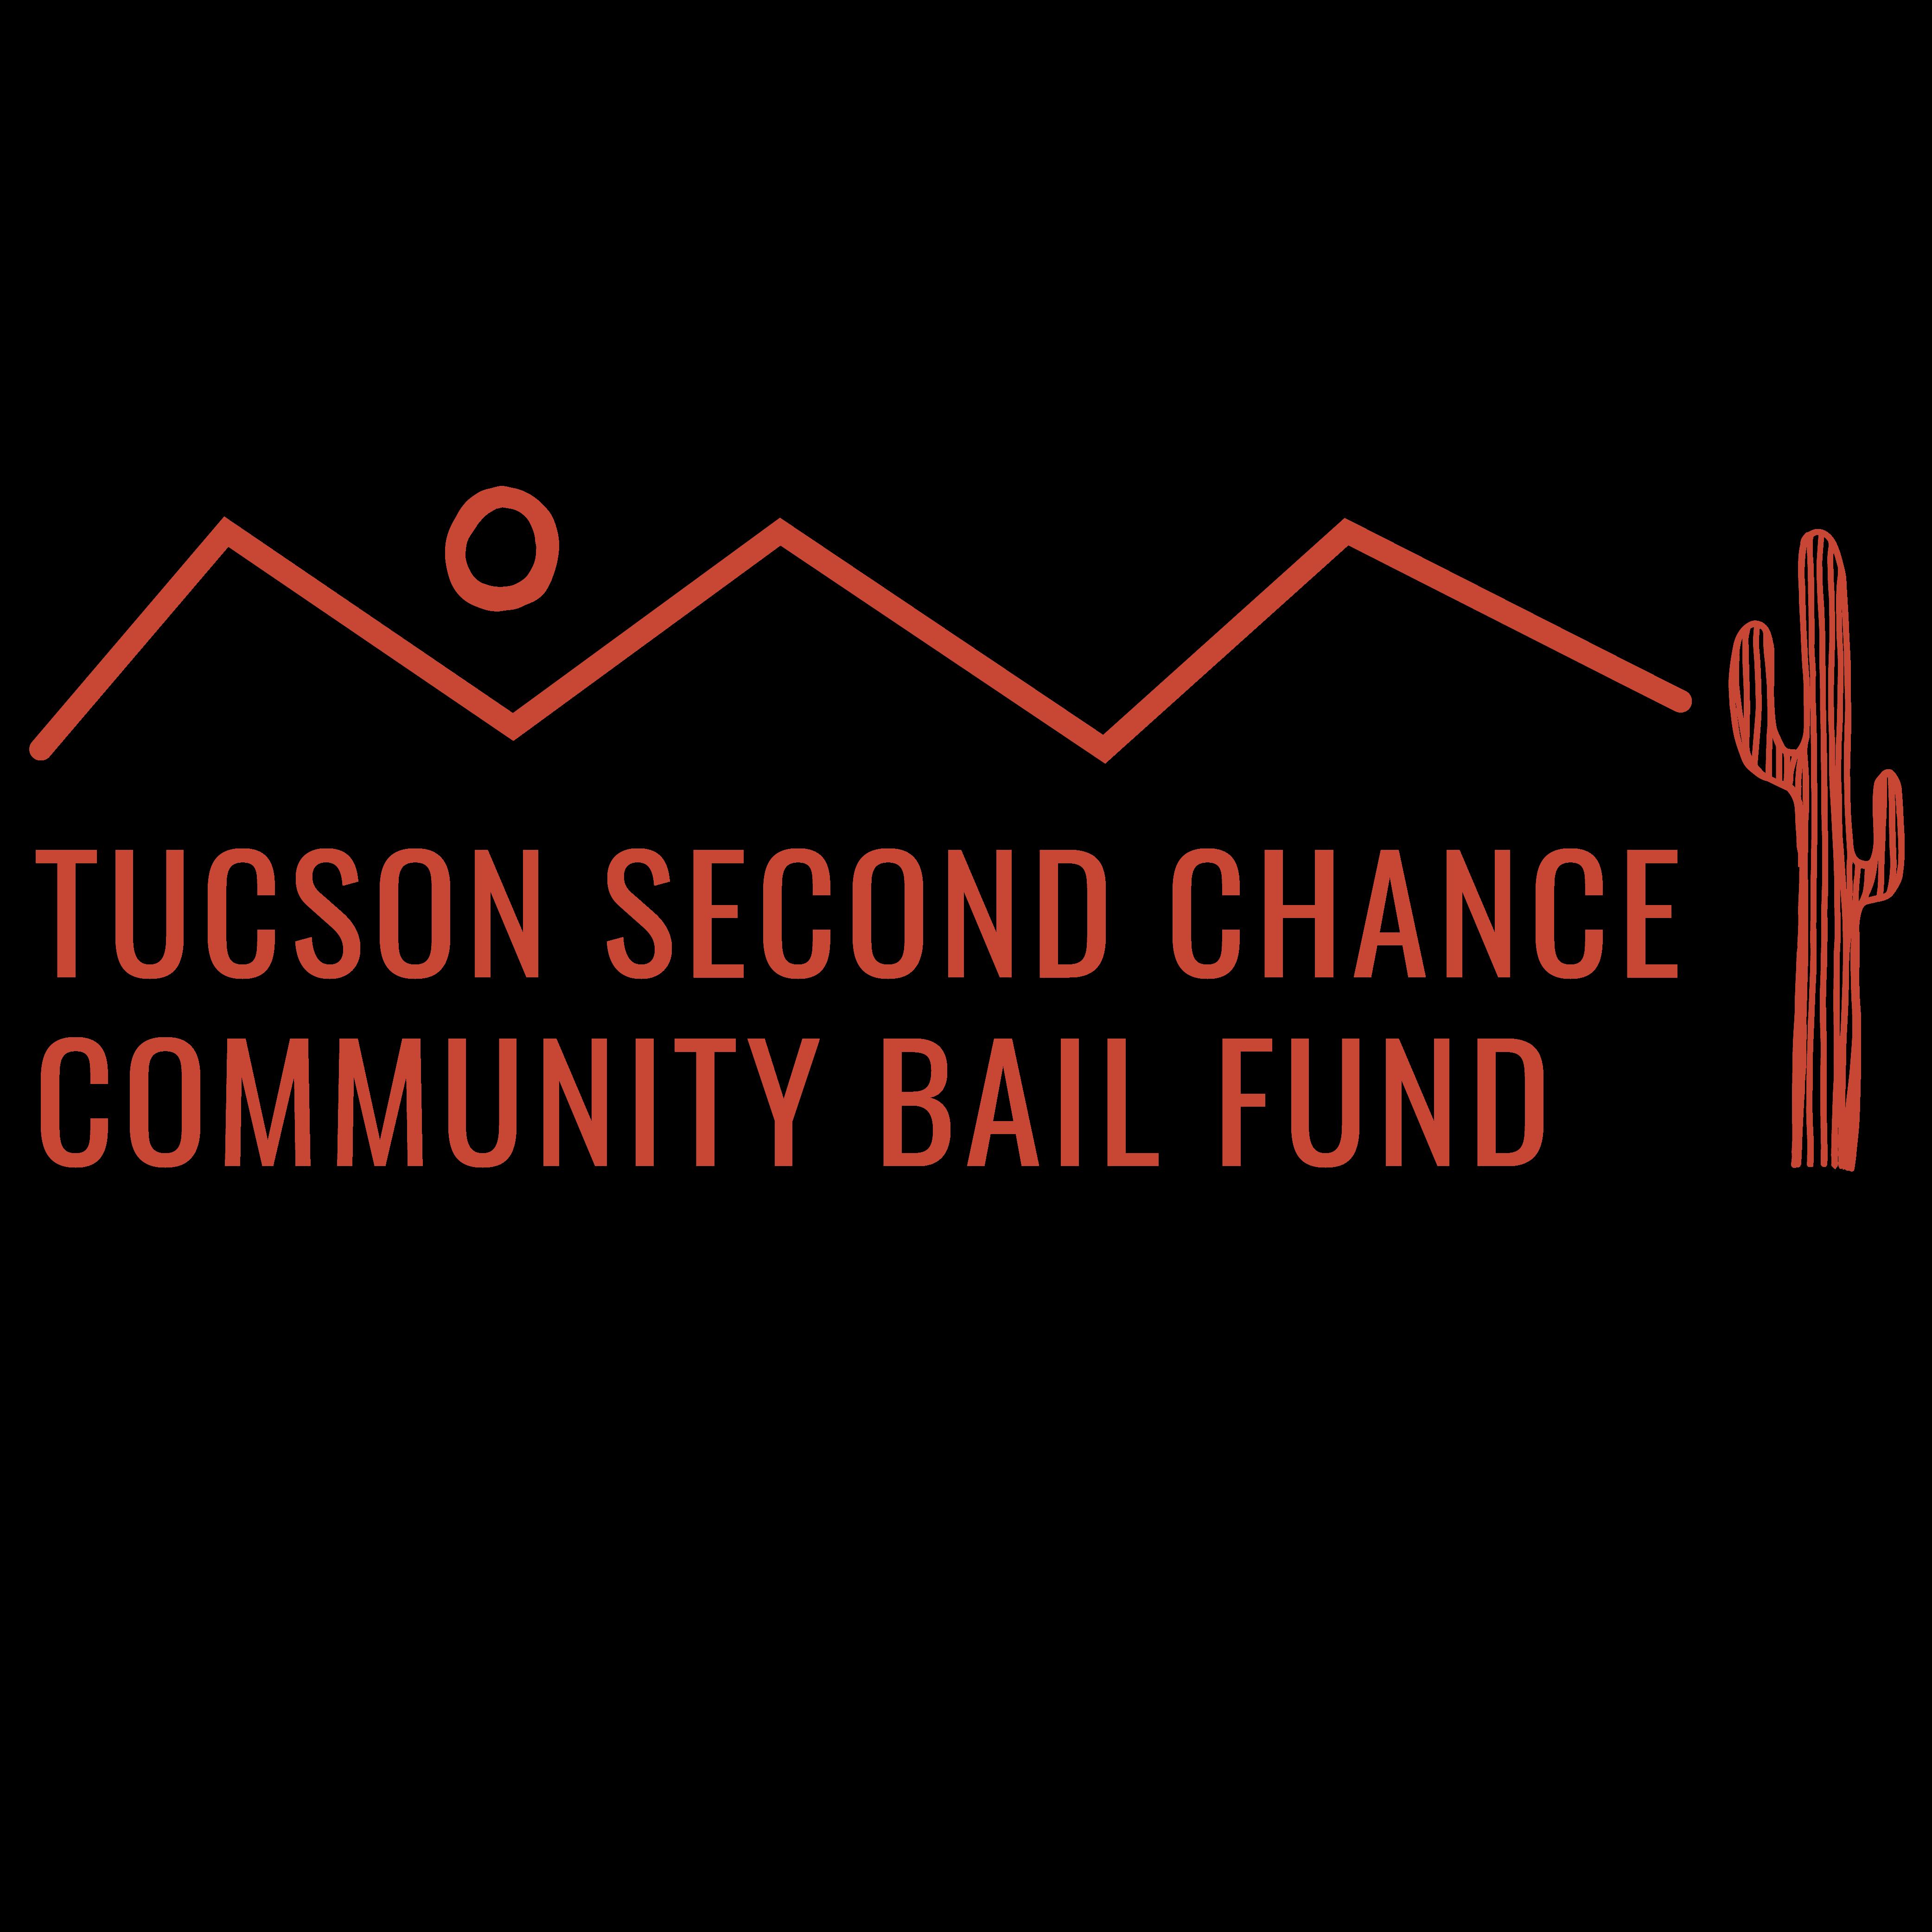 Tucson Second Chance Community Bail Fund